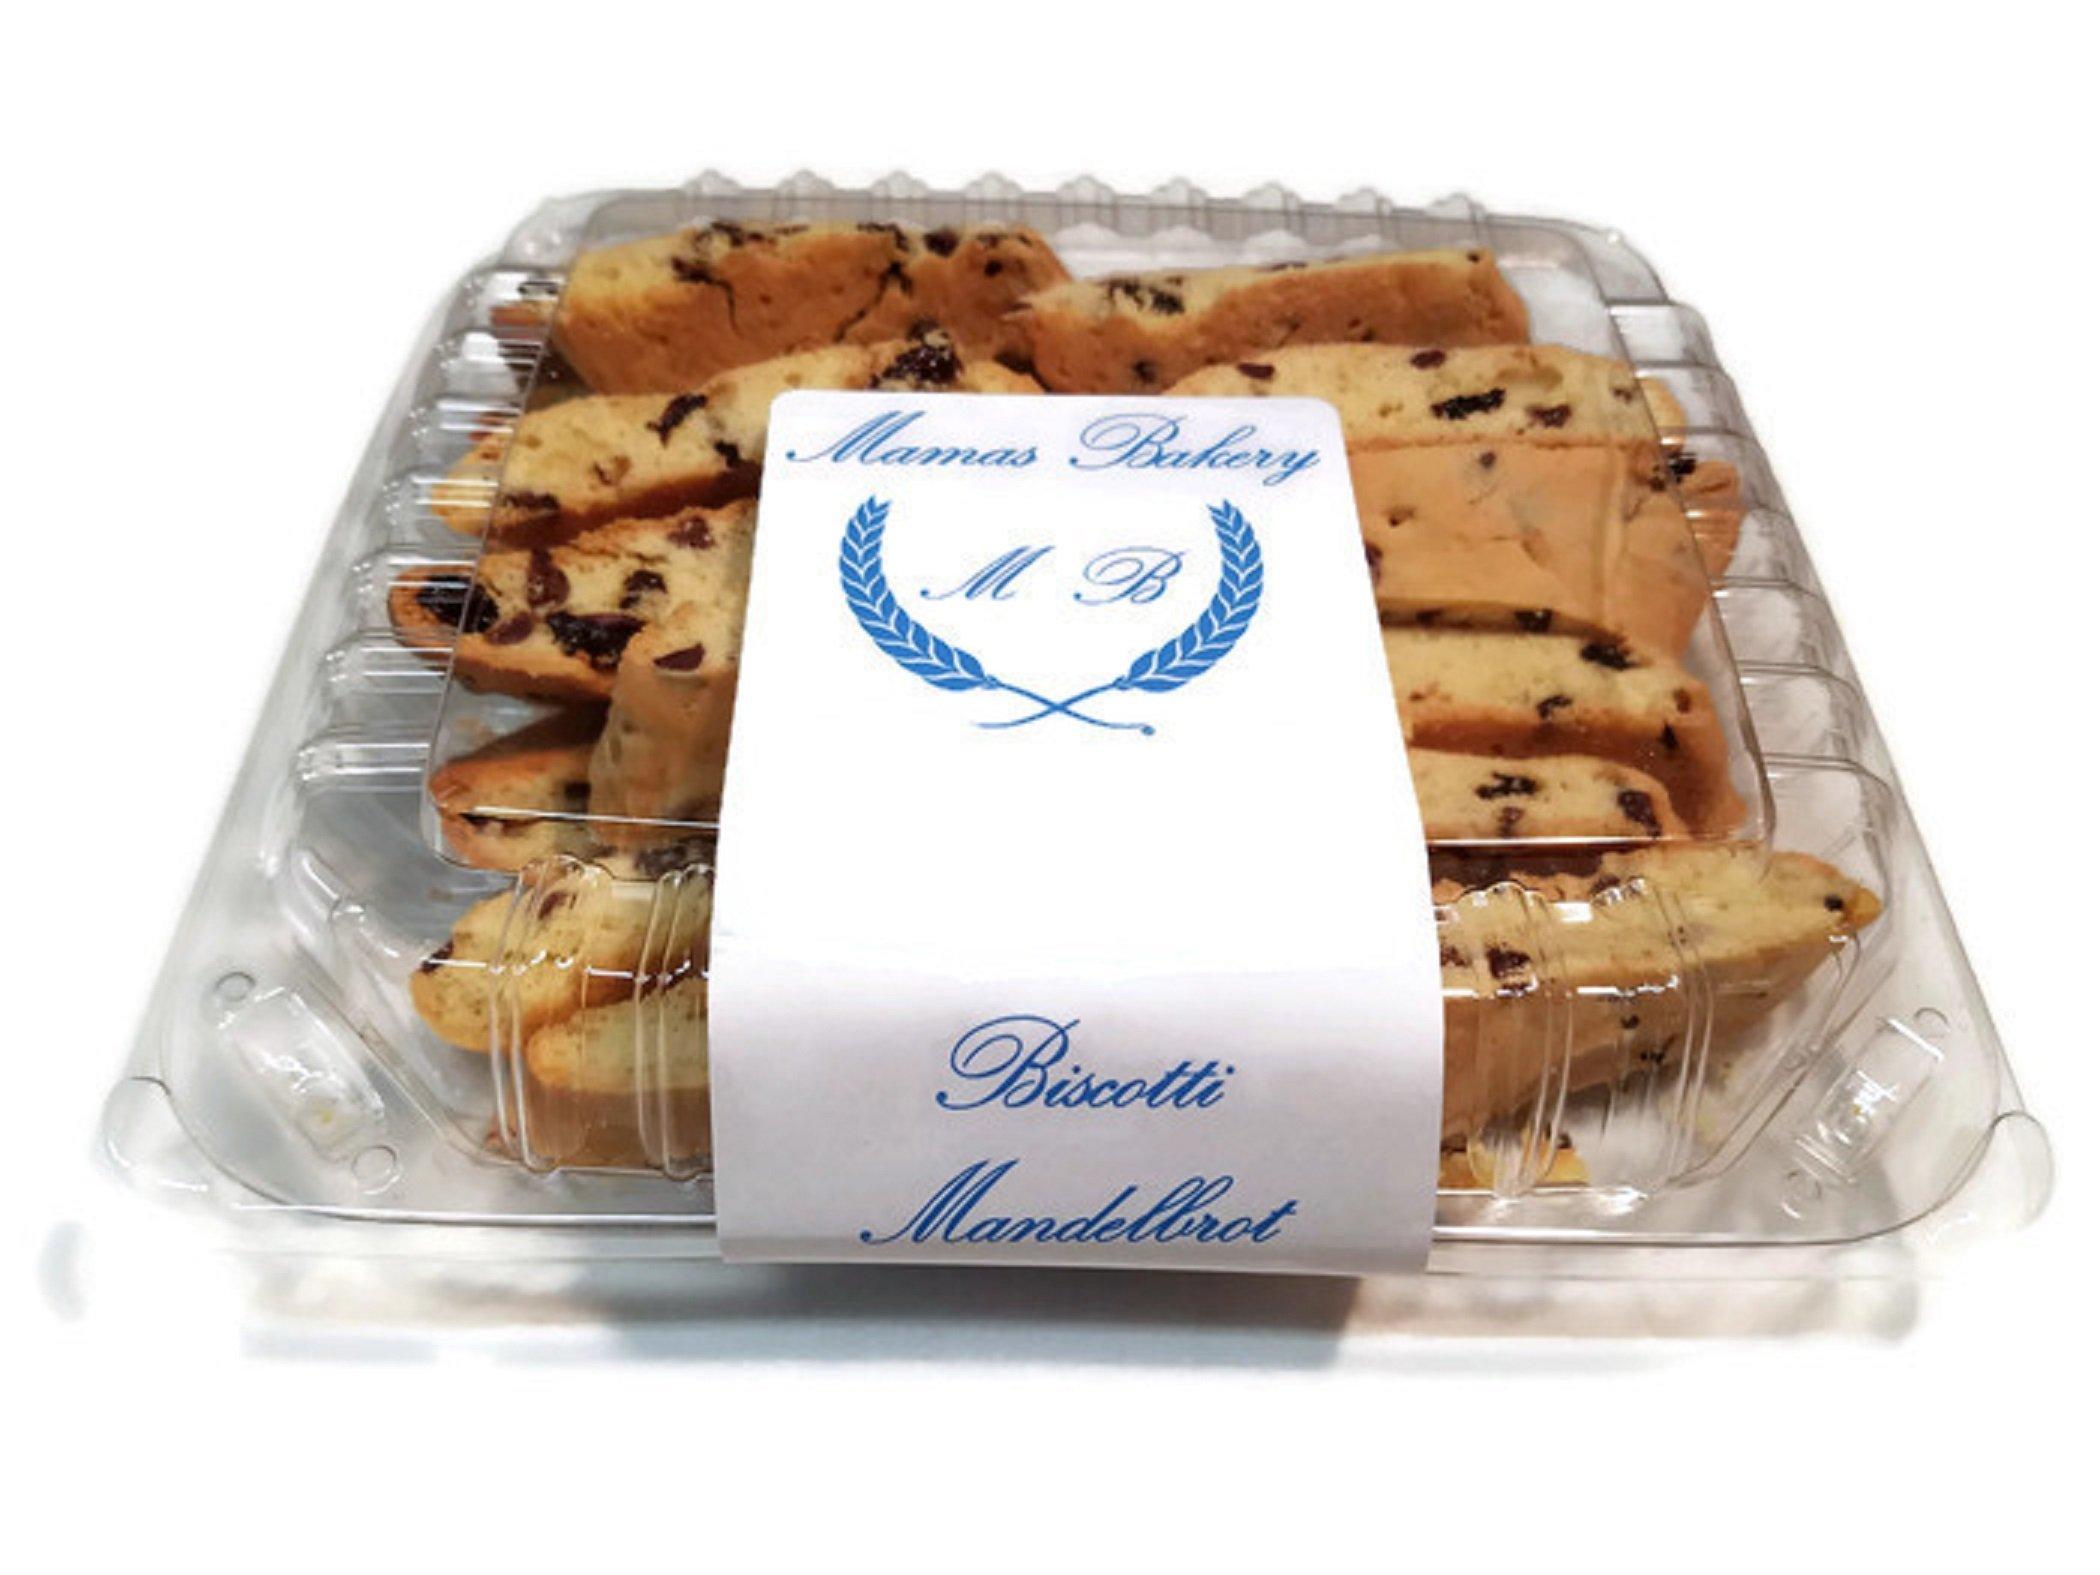 Mamas Bakery Biscotti Mandelbrot (Gluten Free, 3 lbs)